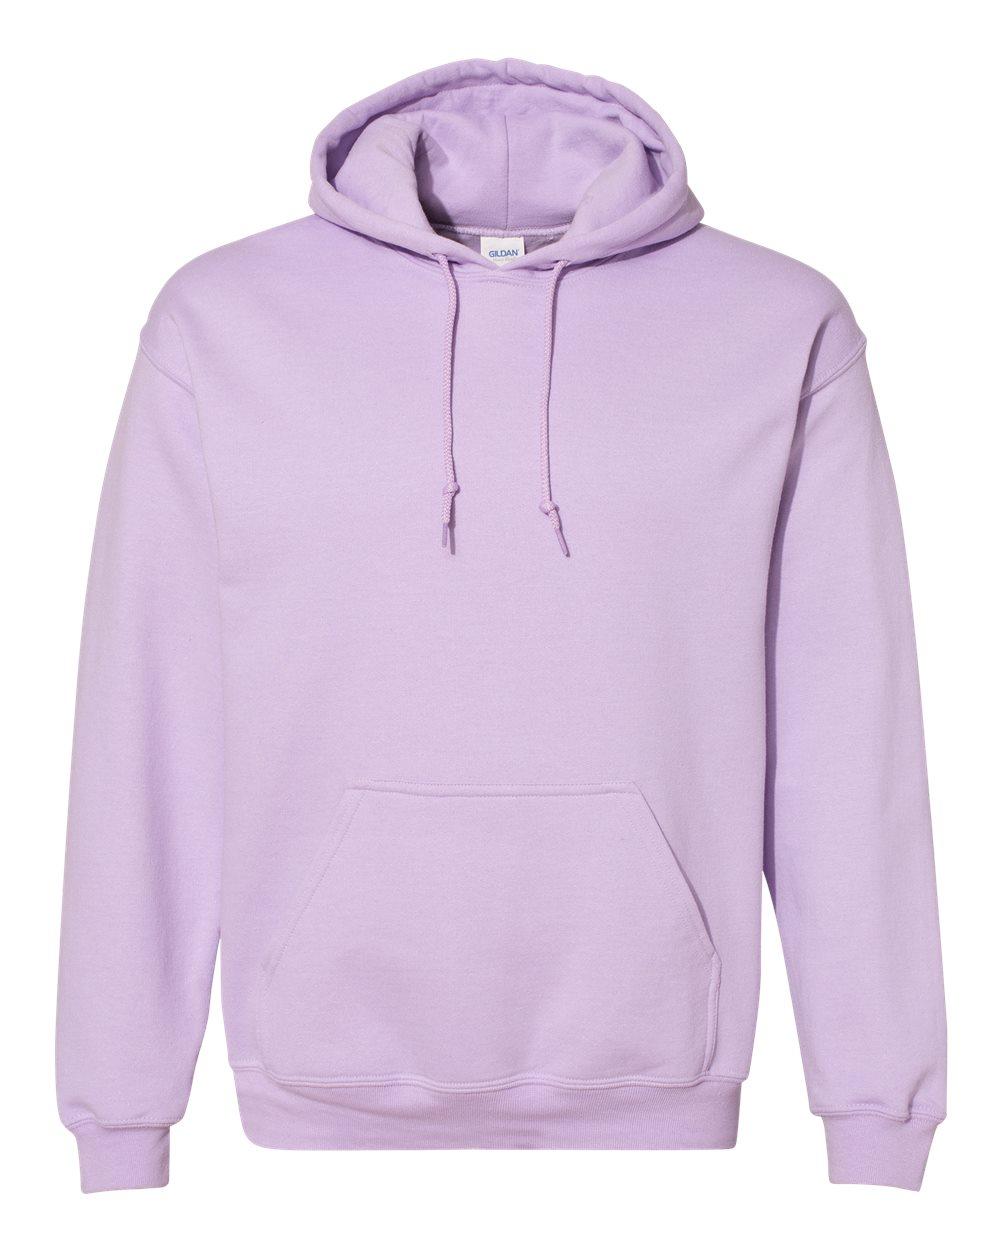 Gildan-Mens-Blank-Hoodie-Heavy-Blend-Hooded-Sweatshirt-18500-up-to-5XL thumbnail 39